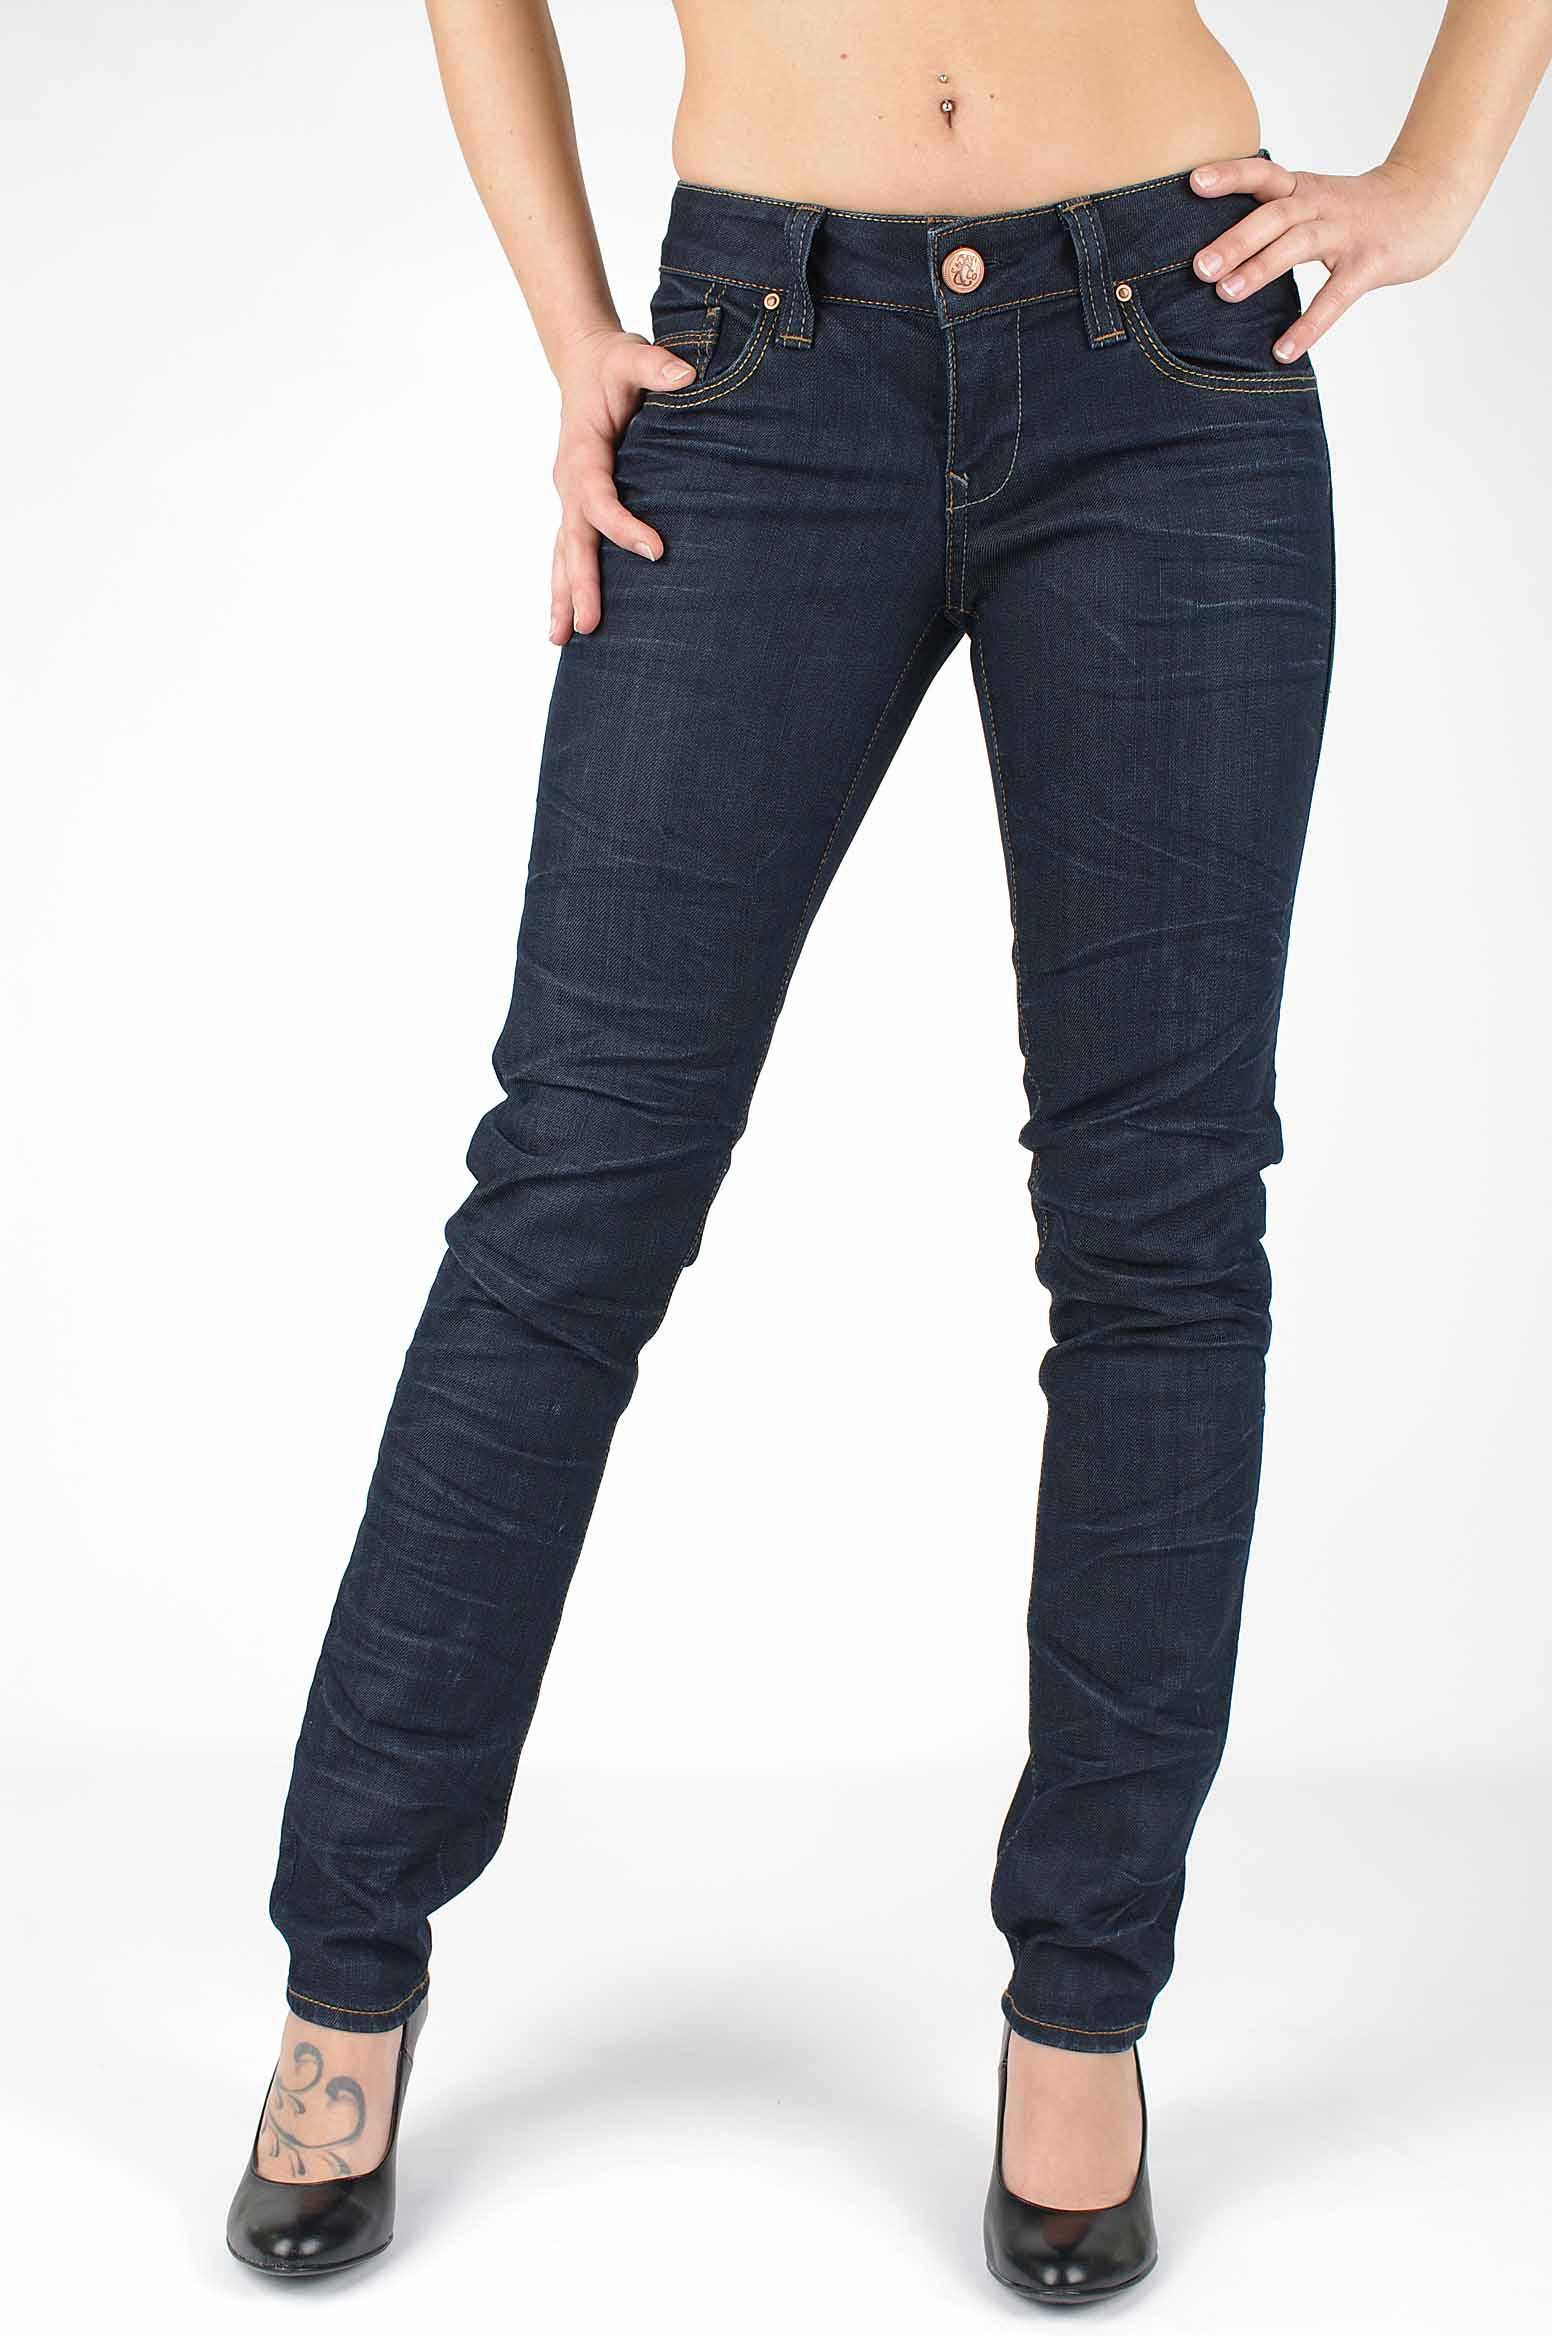 Jeans Pflege